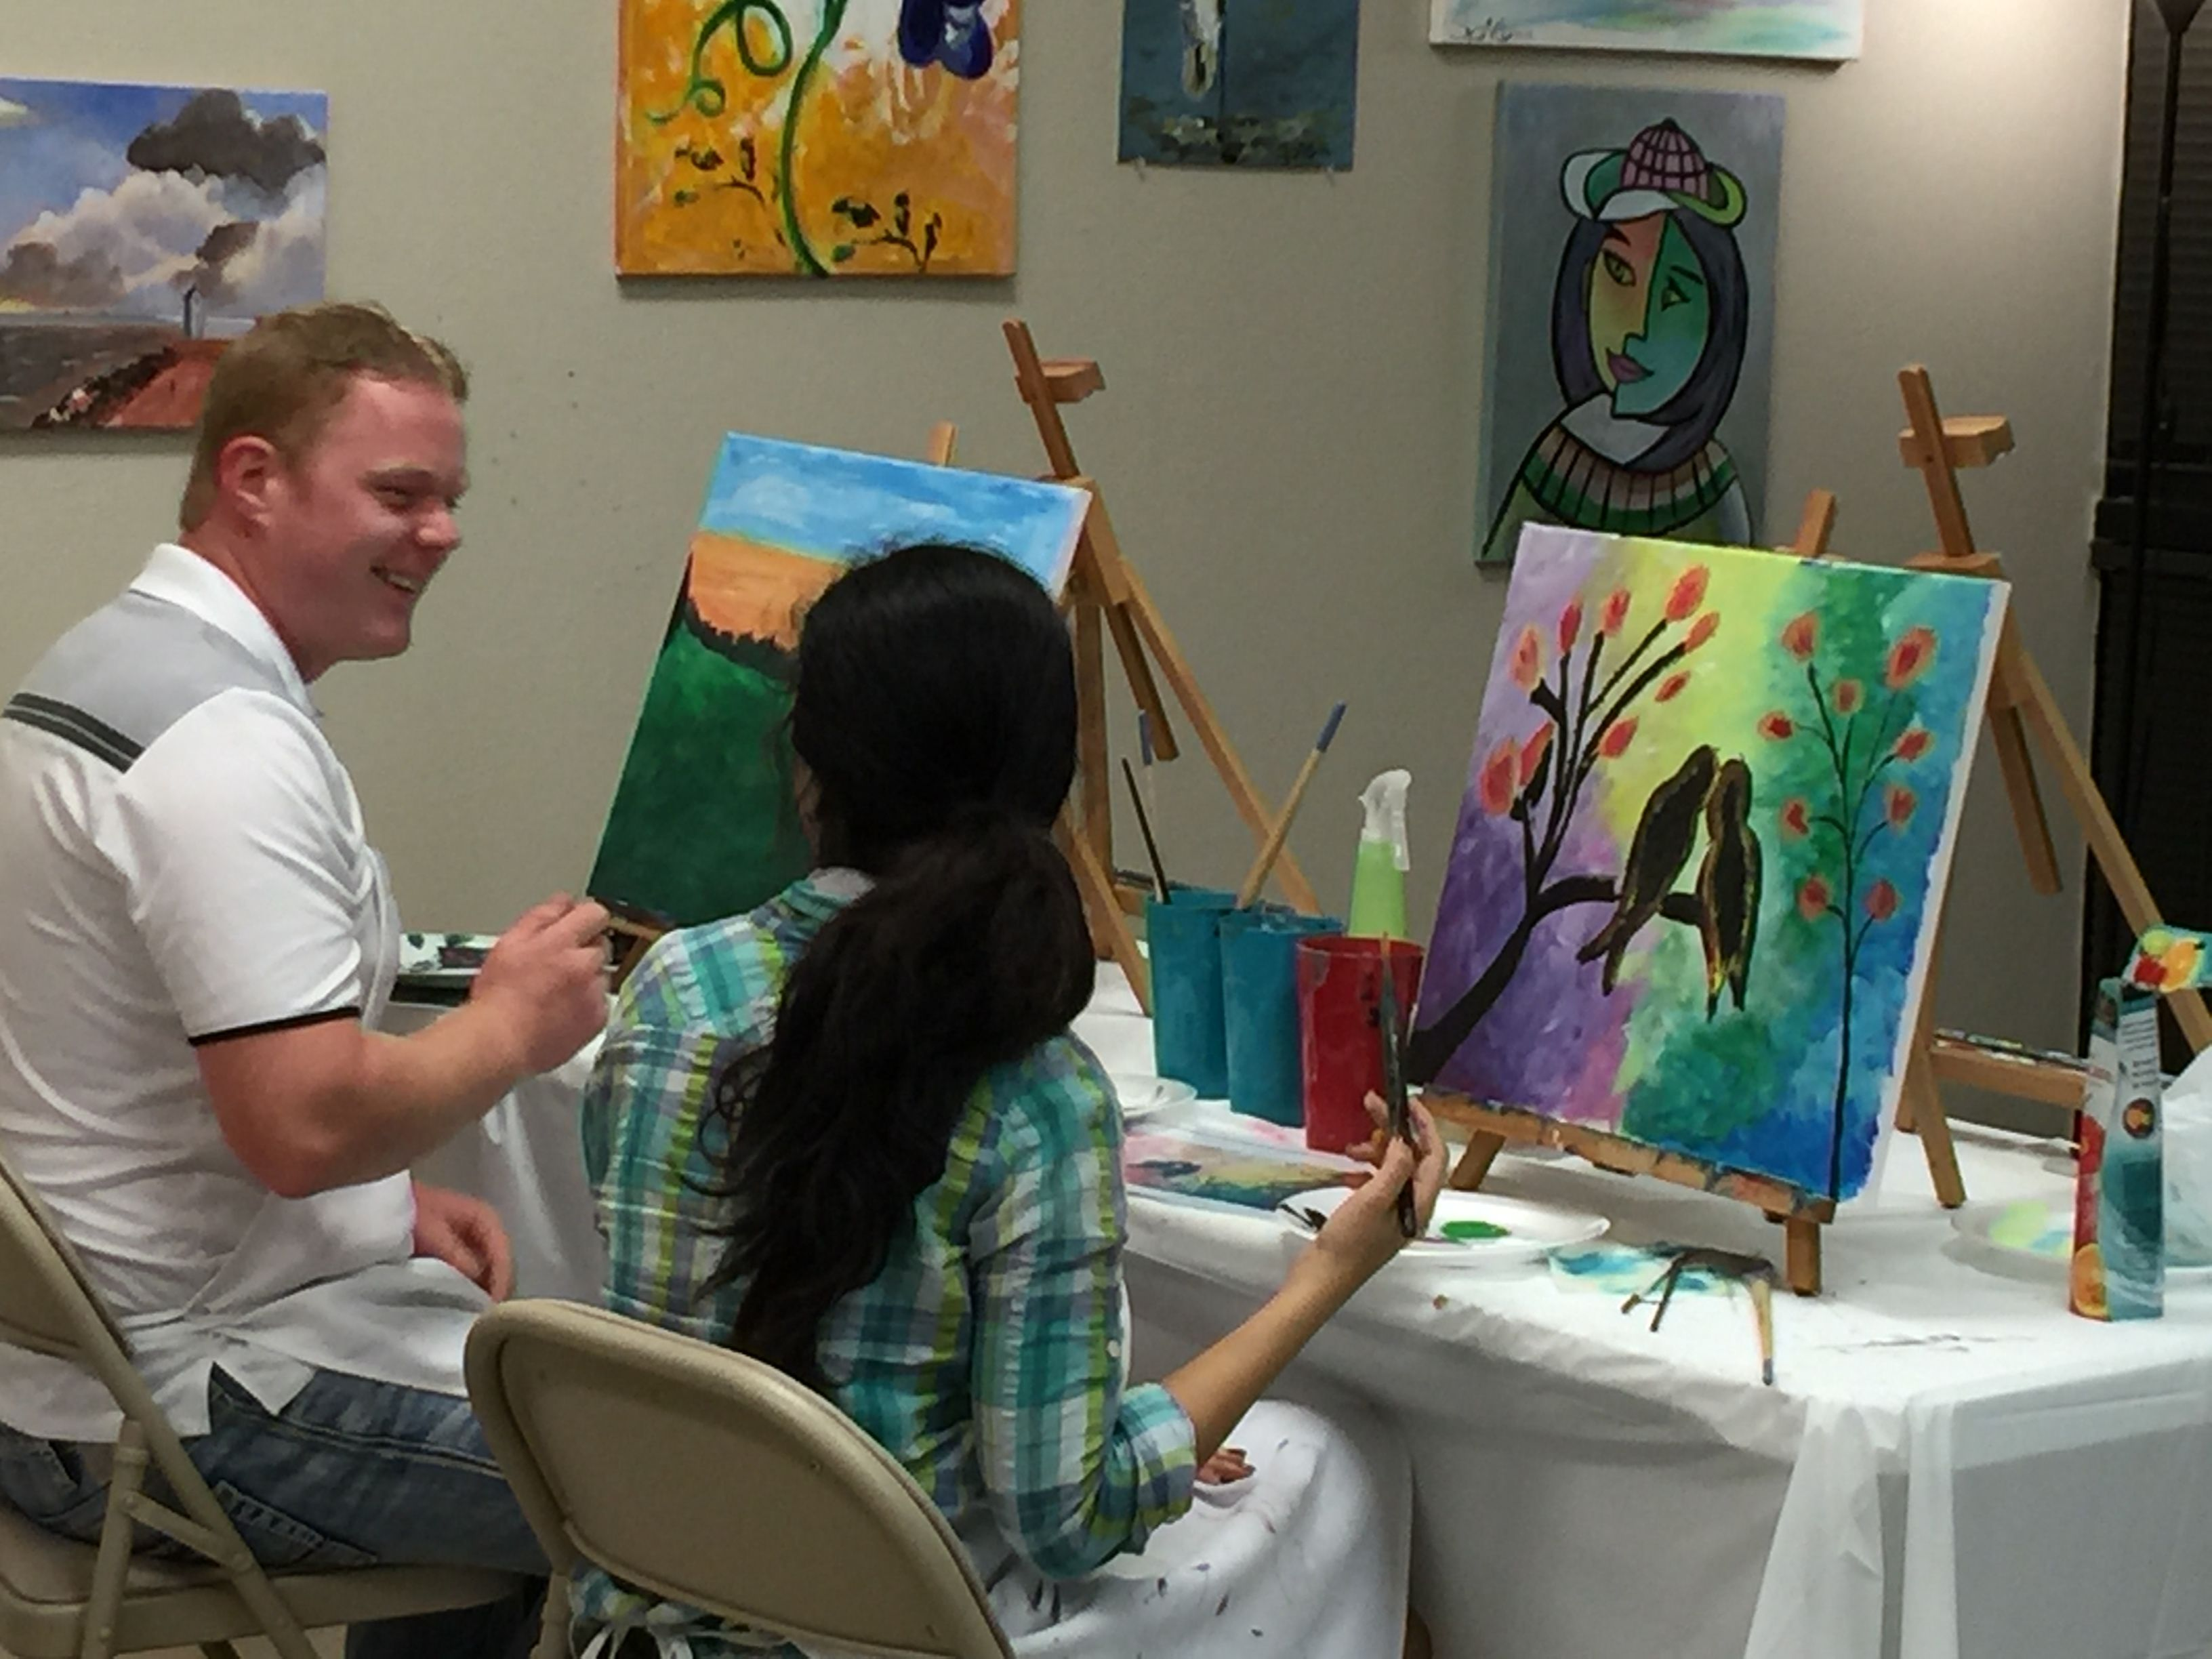 Dallas art classes for adults